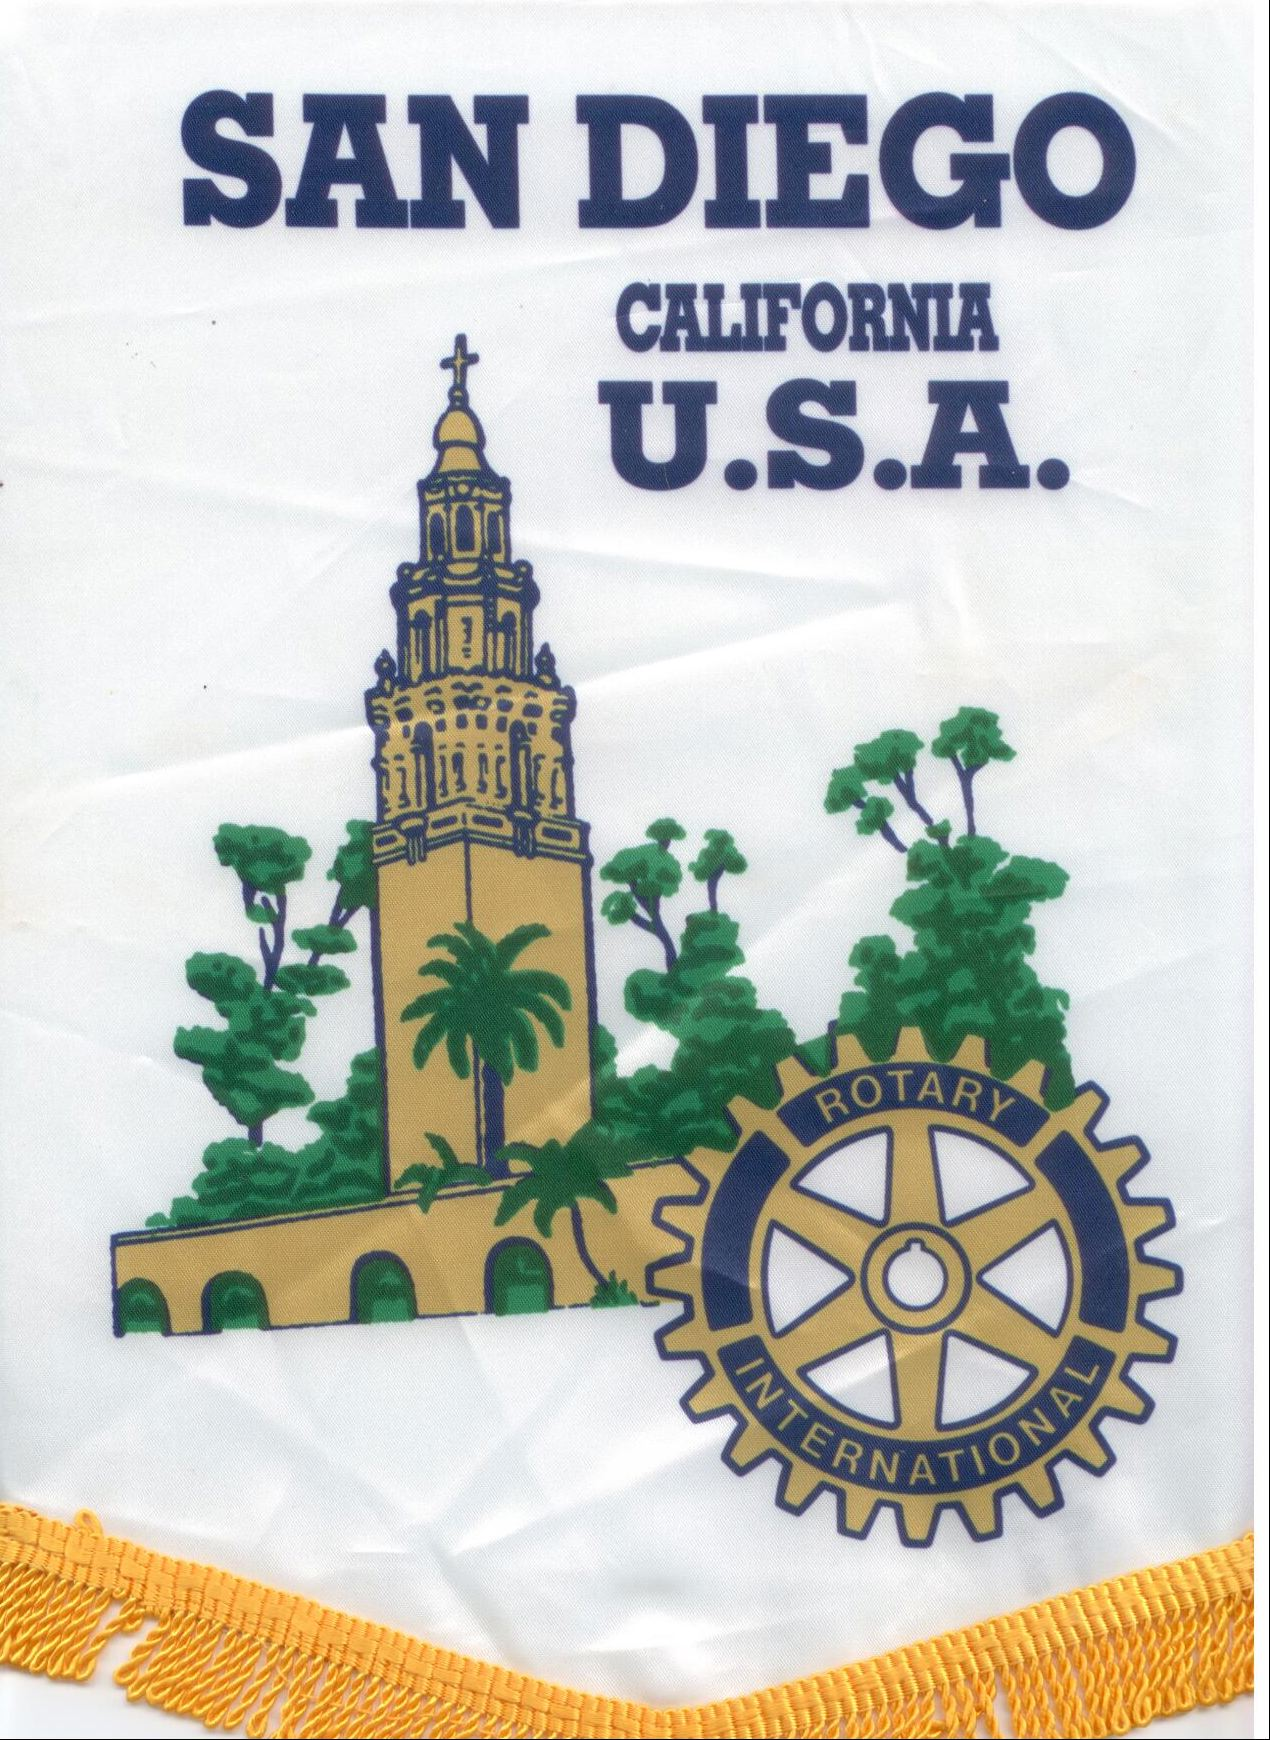 San Diego Rotary